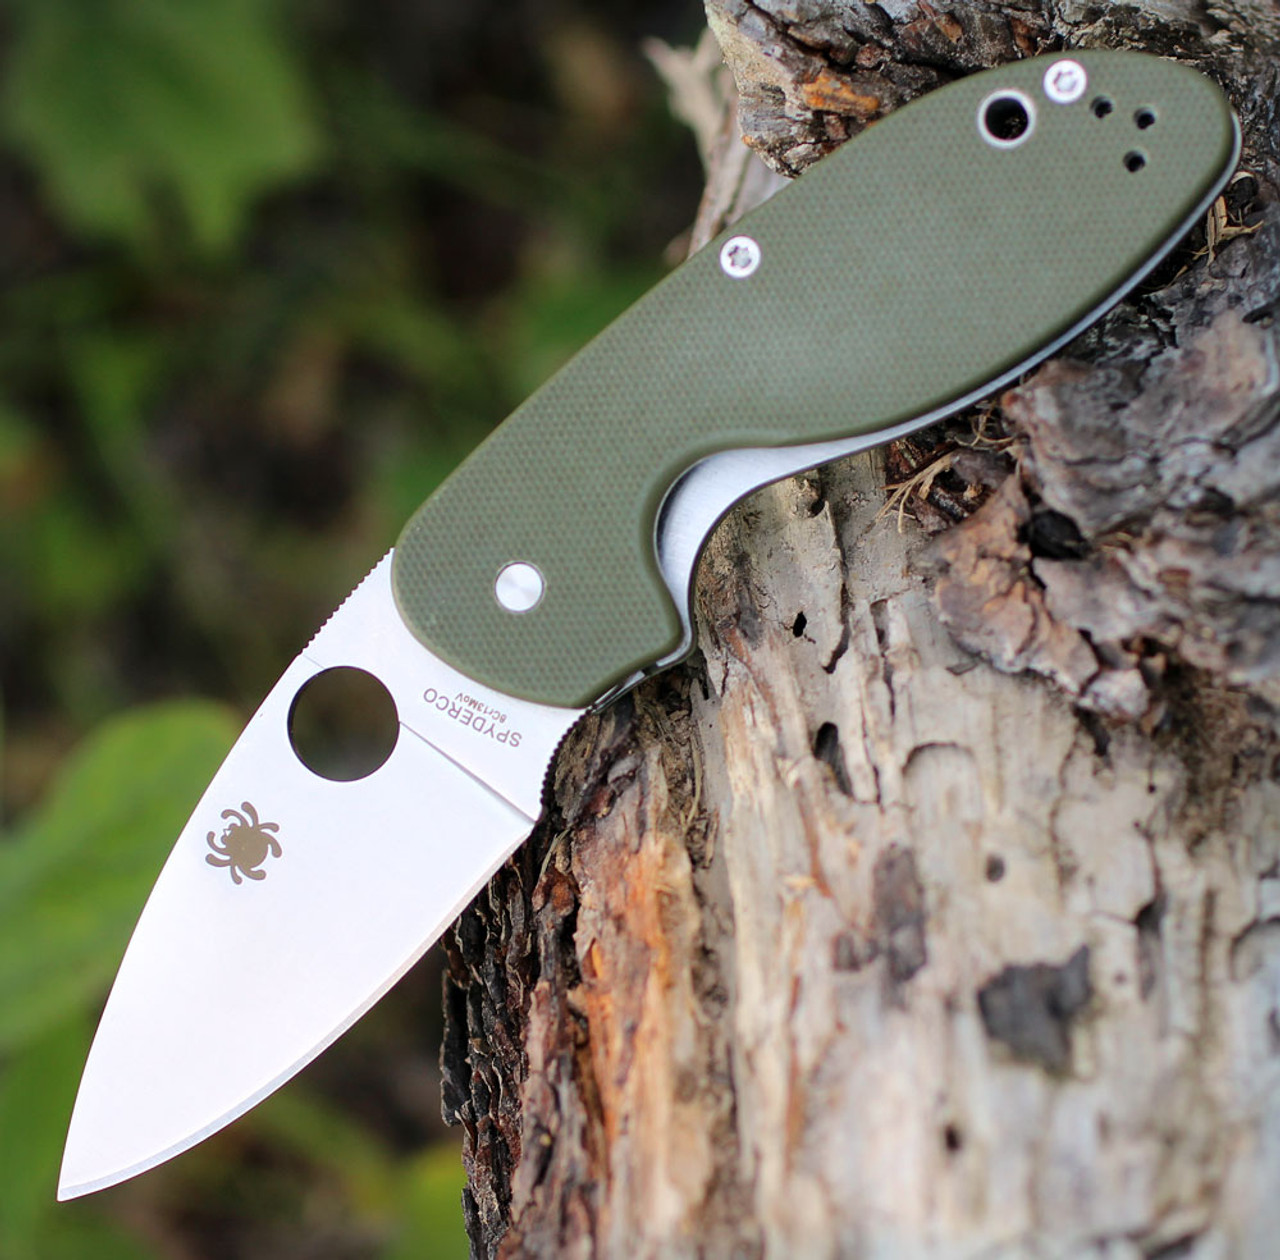 Spyderco C216GPGR EFFICIENT, Satin Plain Blade, Green G-10 Handle